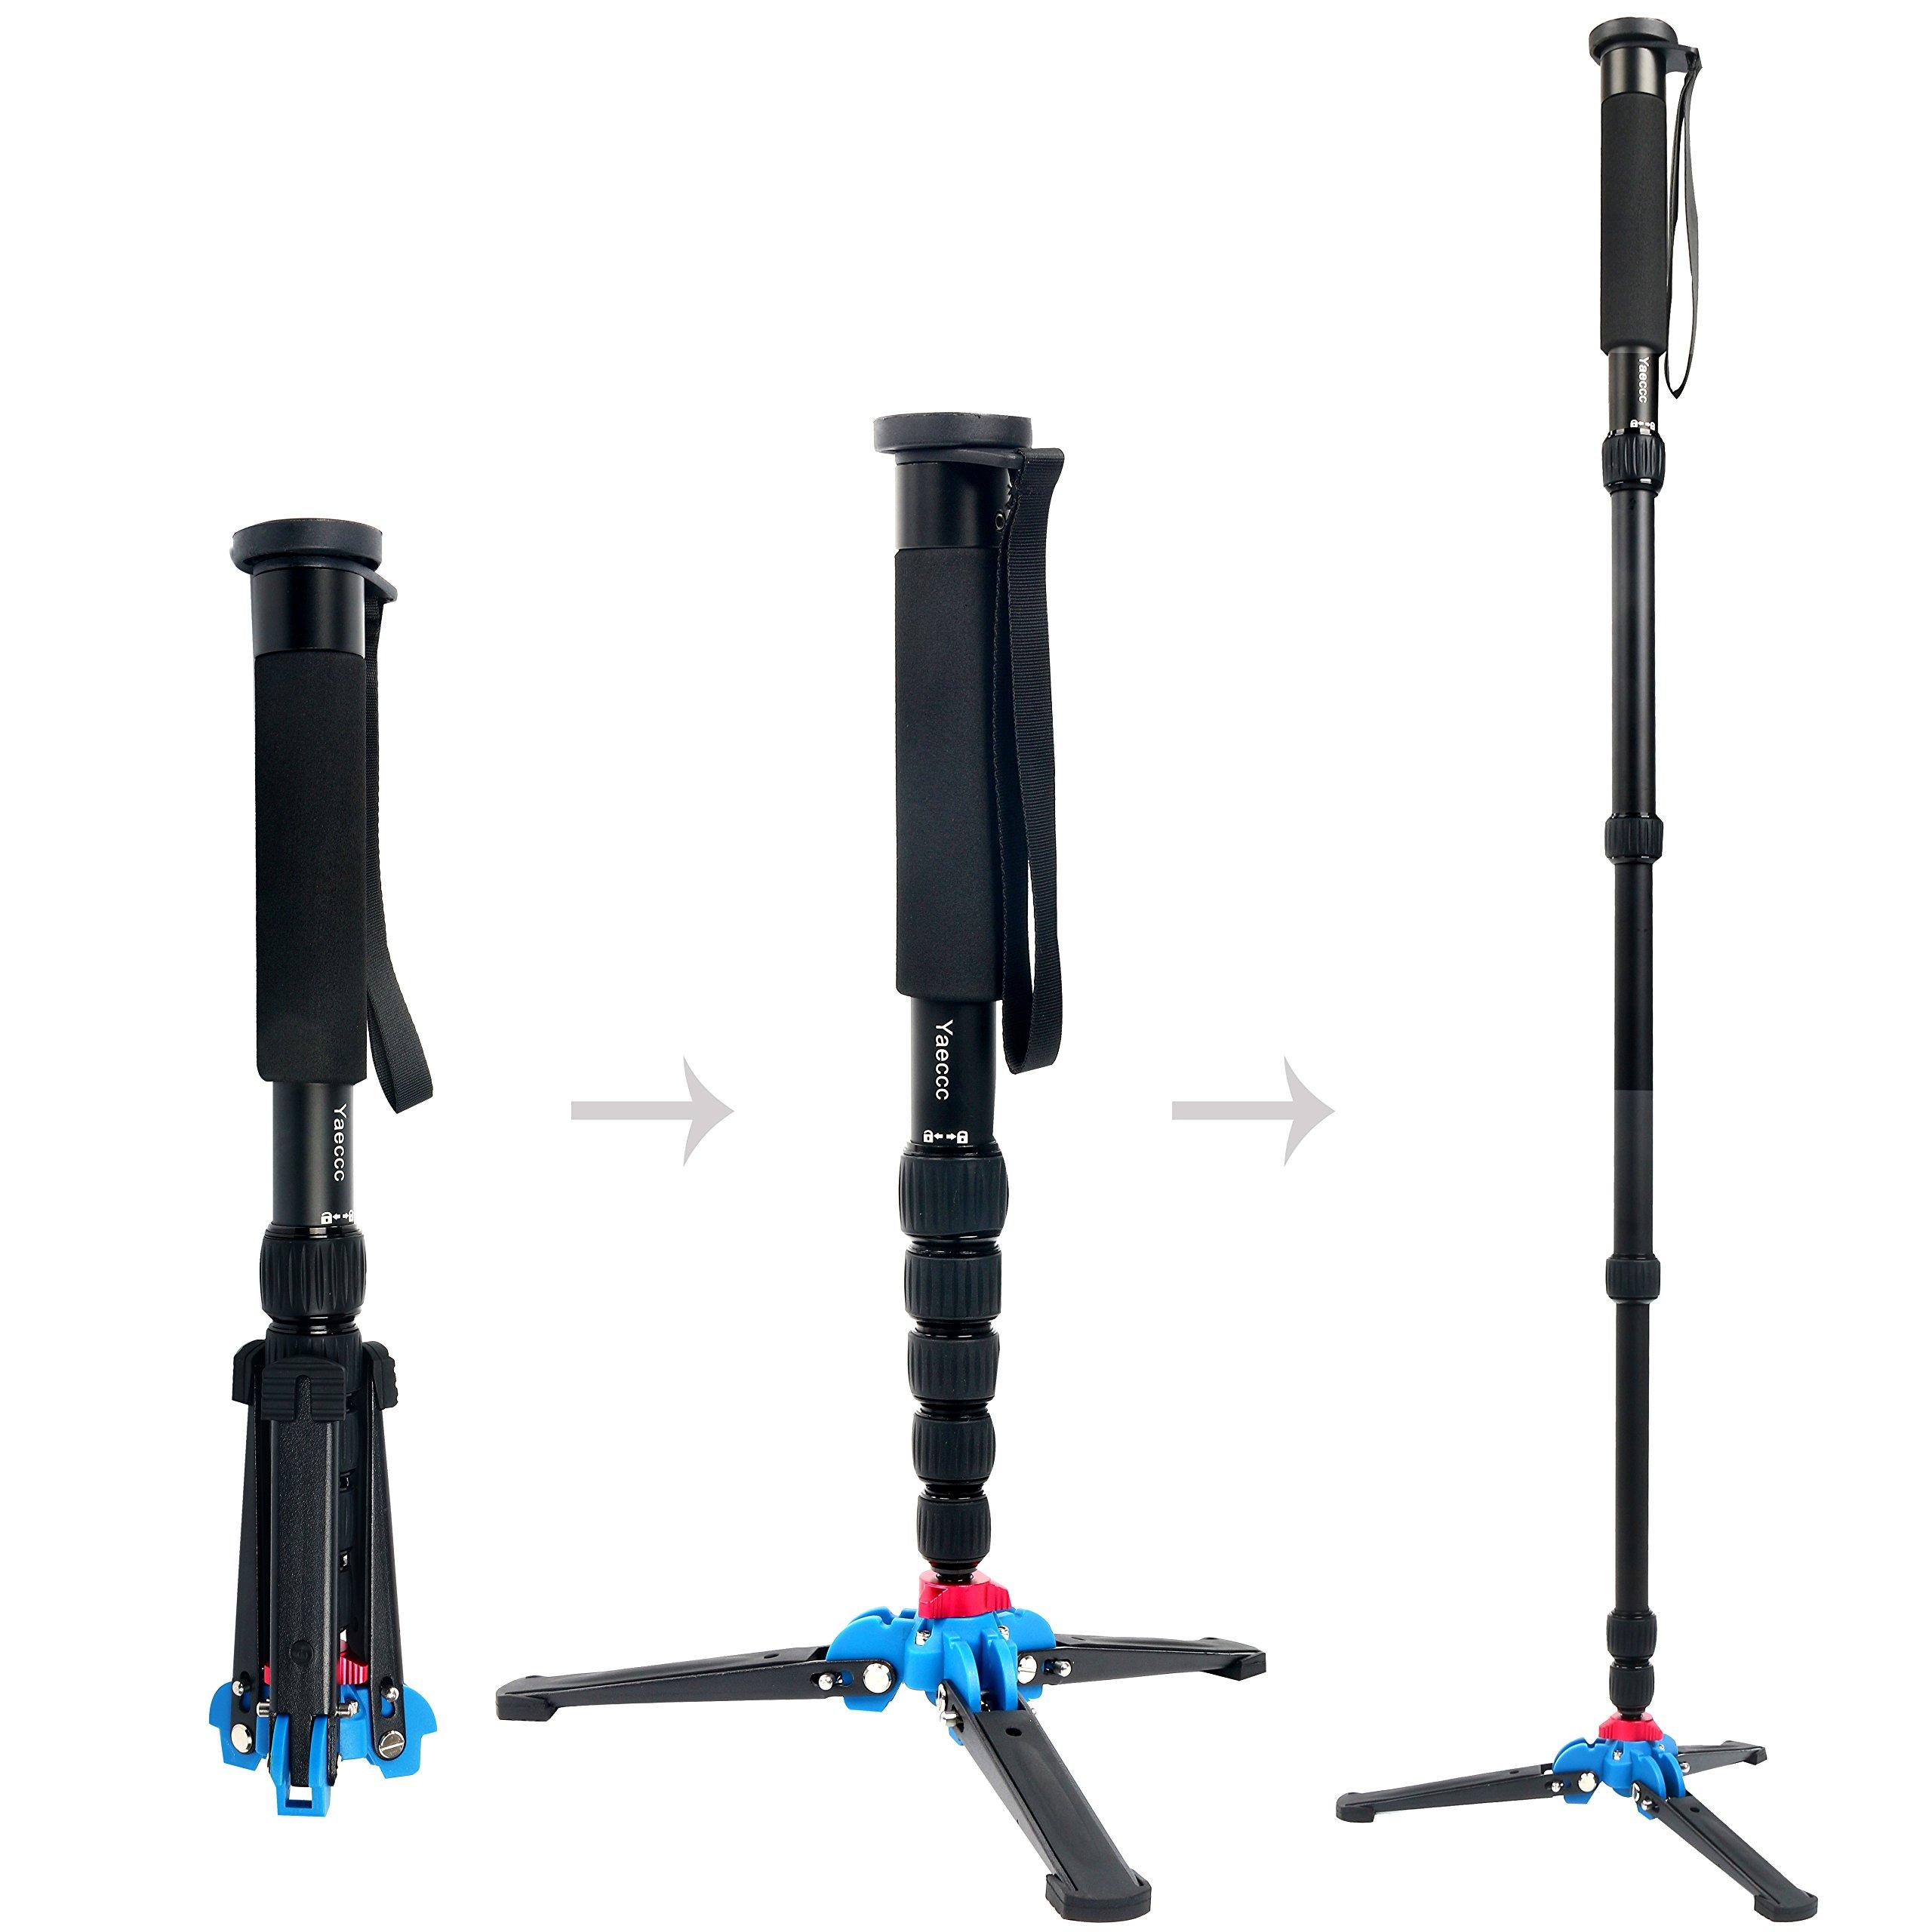 YaeCCC Lightweight Portable 63-inches Camera Aluminium Monopod with Folding Three Feet Support Stand. 6-Section Leg, Leg max Diameter: Φ28MM, Folding Length: 420mm (16.5'').(K-266 Black)